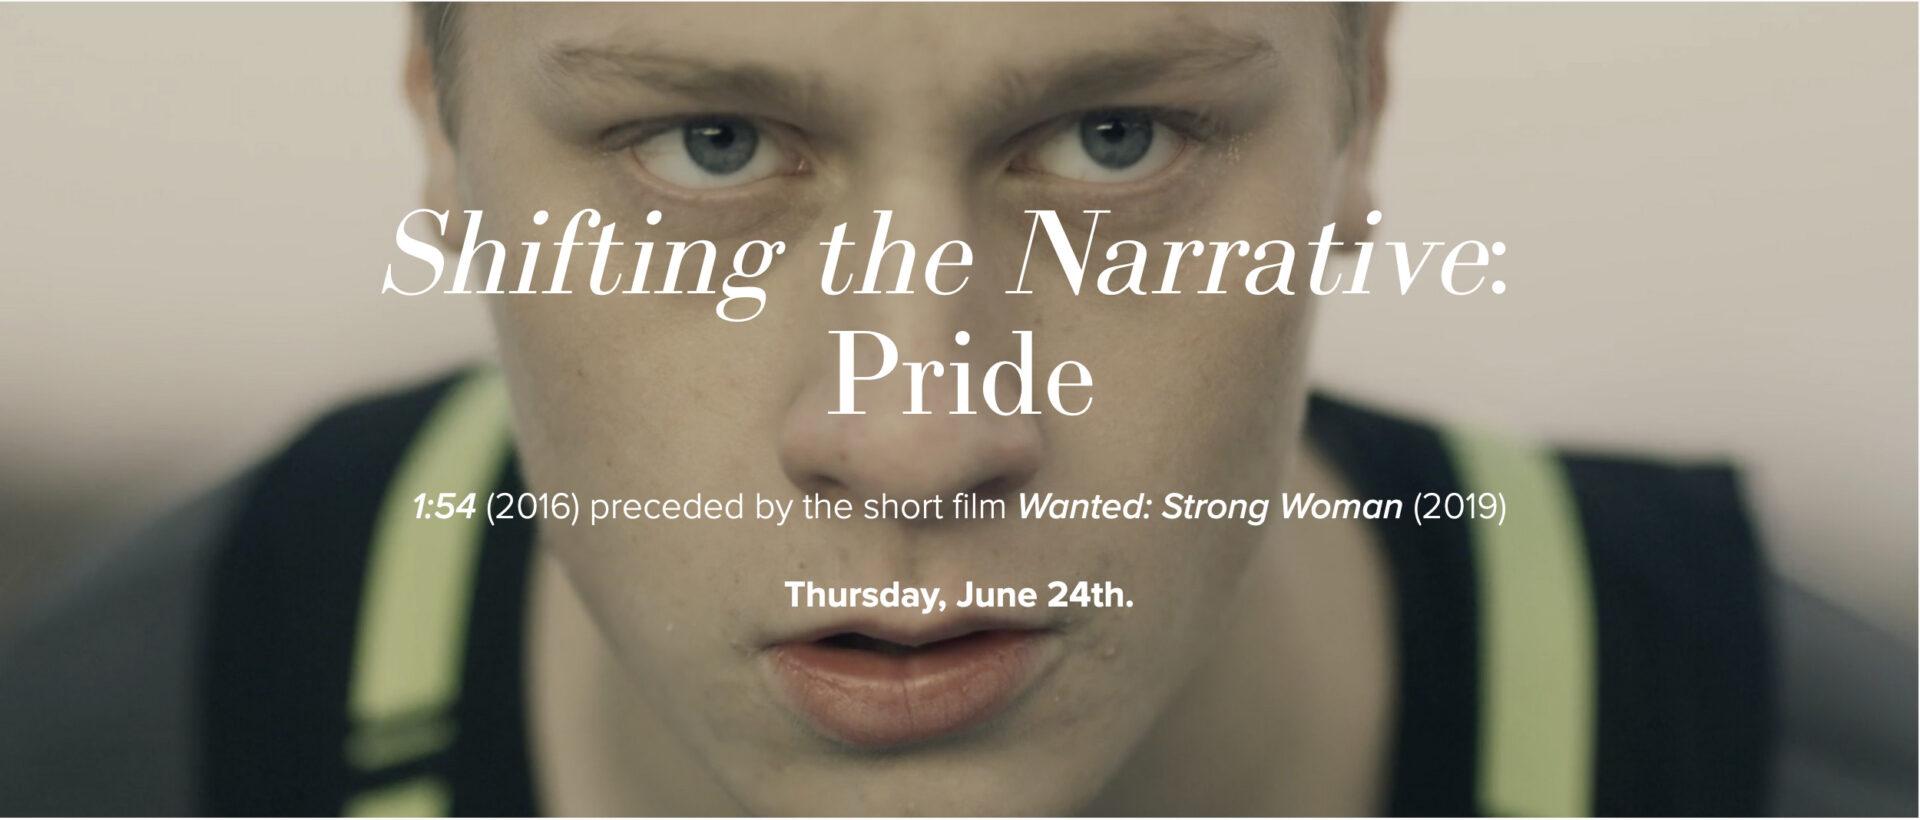 Shifting the Narrative; Pride